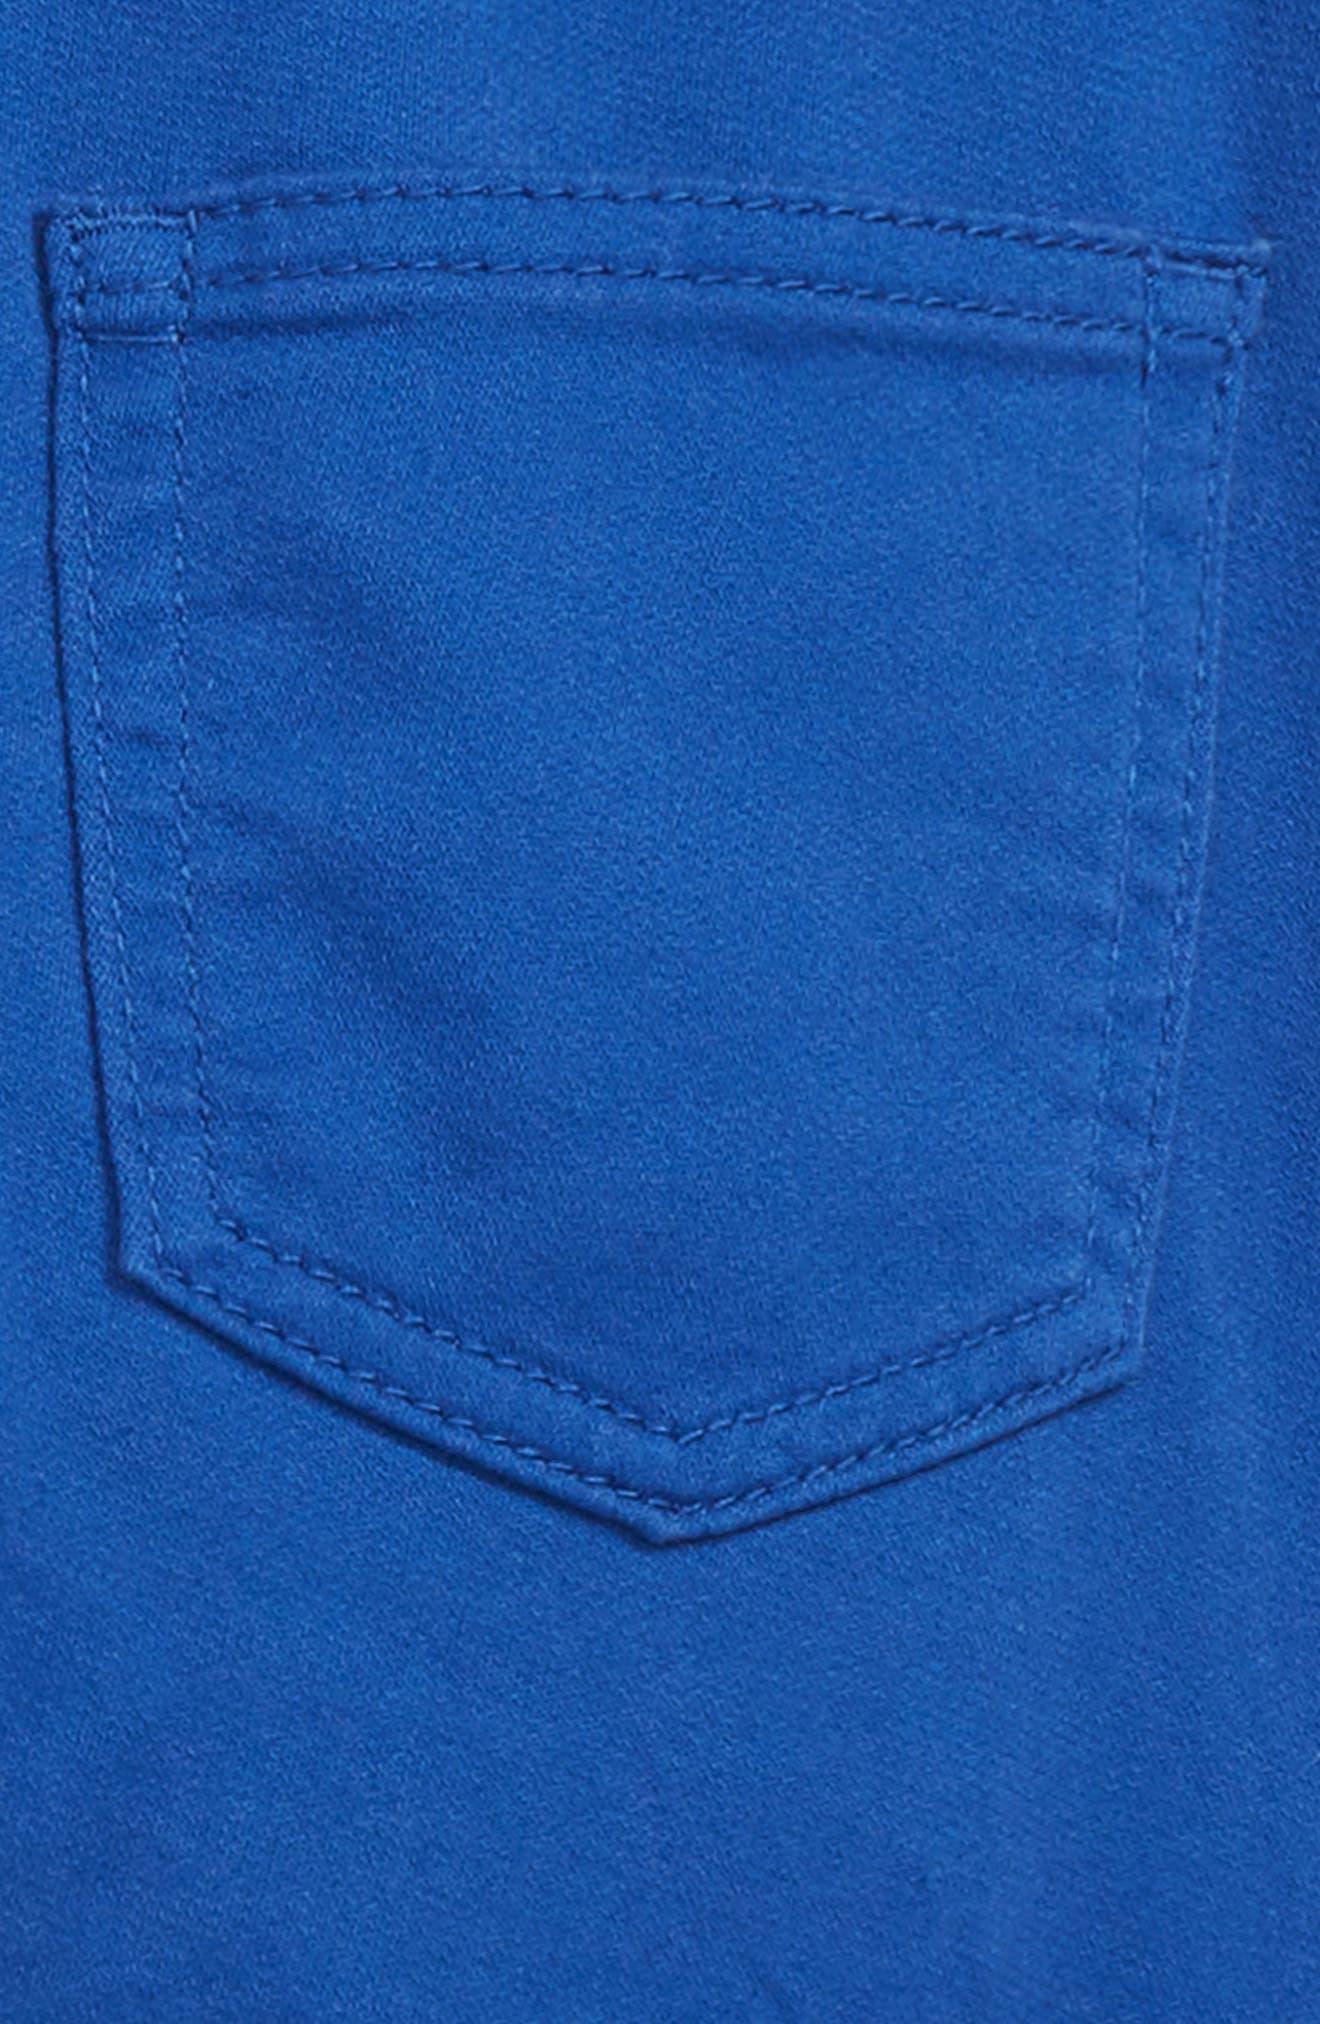 Runaround Garment Dye Jeans,                             Alternate thumbnail 3, color,                             LAGOON BLUE